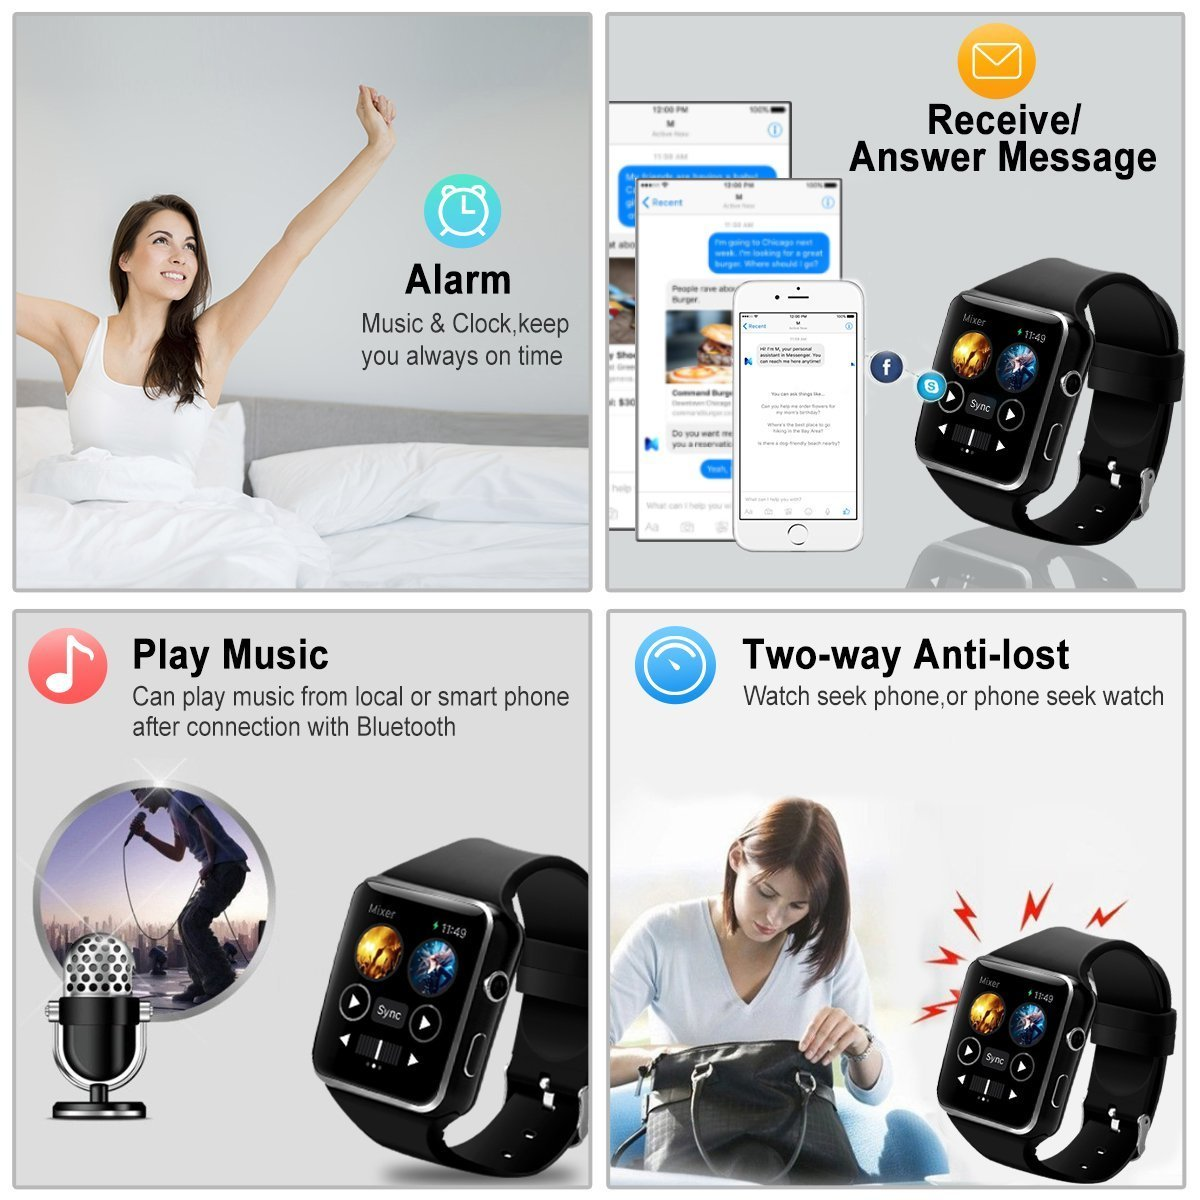 Smart Watch,Bluetooth Smartwatch Touch Screen Wrist Watch with Camera/SIM  Card Slot,Waterproof Smart Watch Sports Fitness Tracker Android Phone Watch